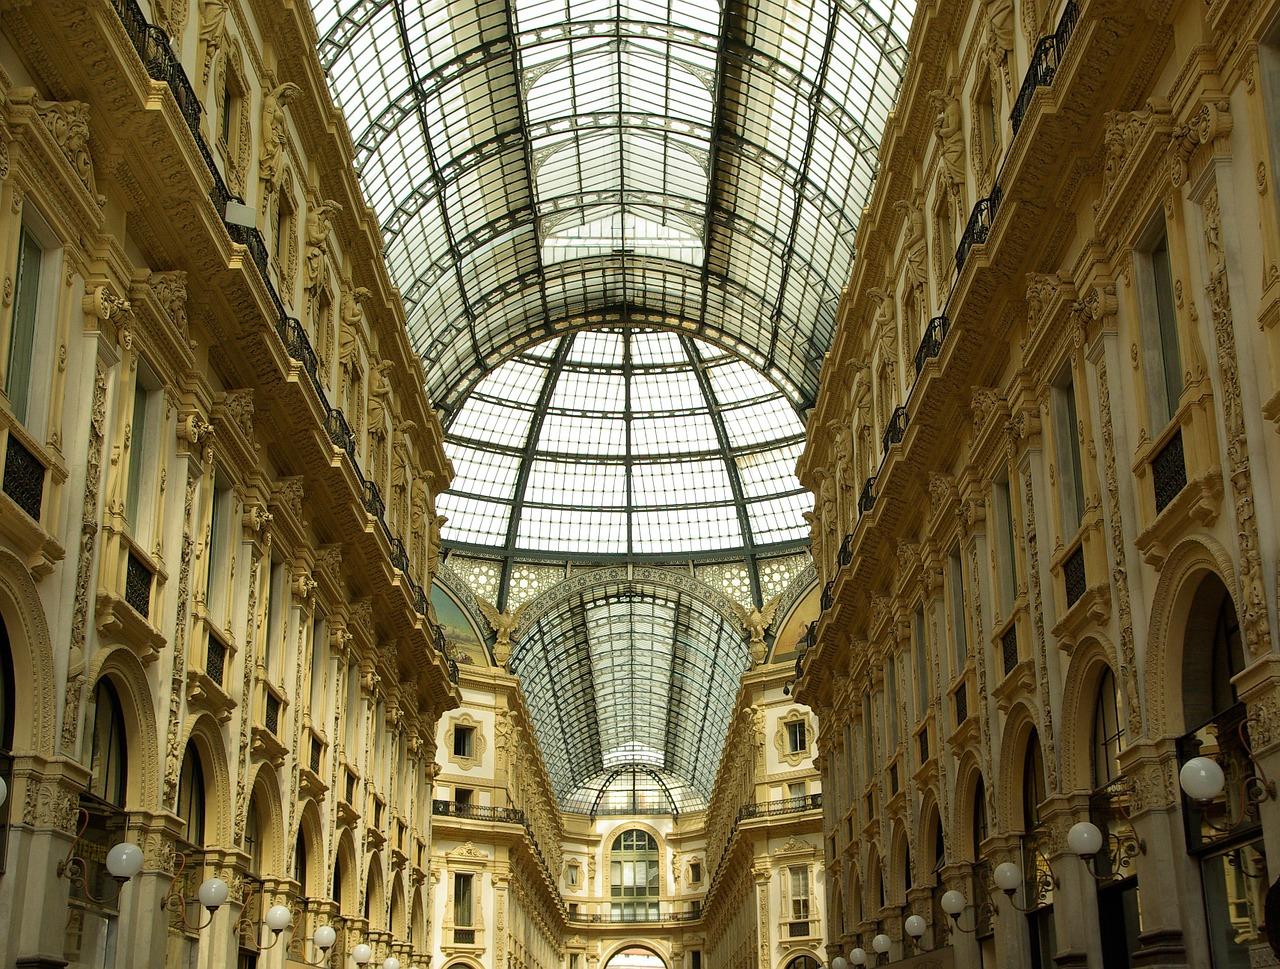 Milan Galleria Vittorio Emmanuele II